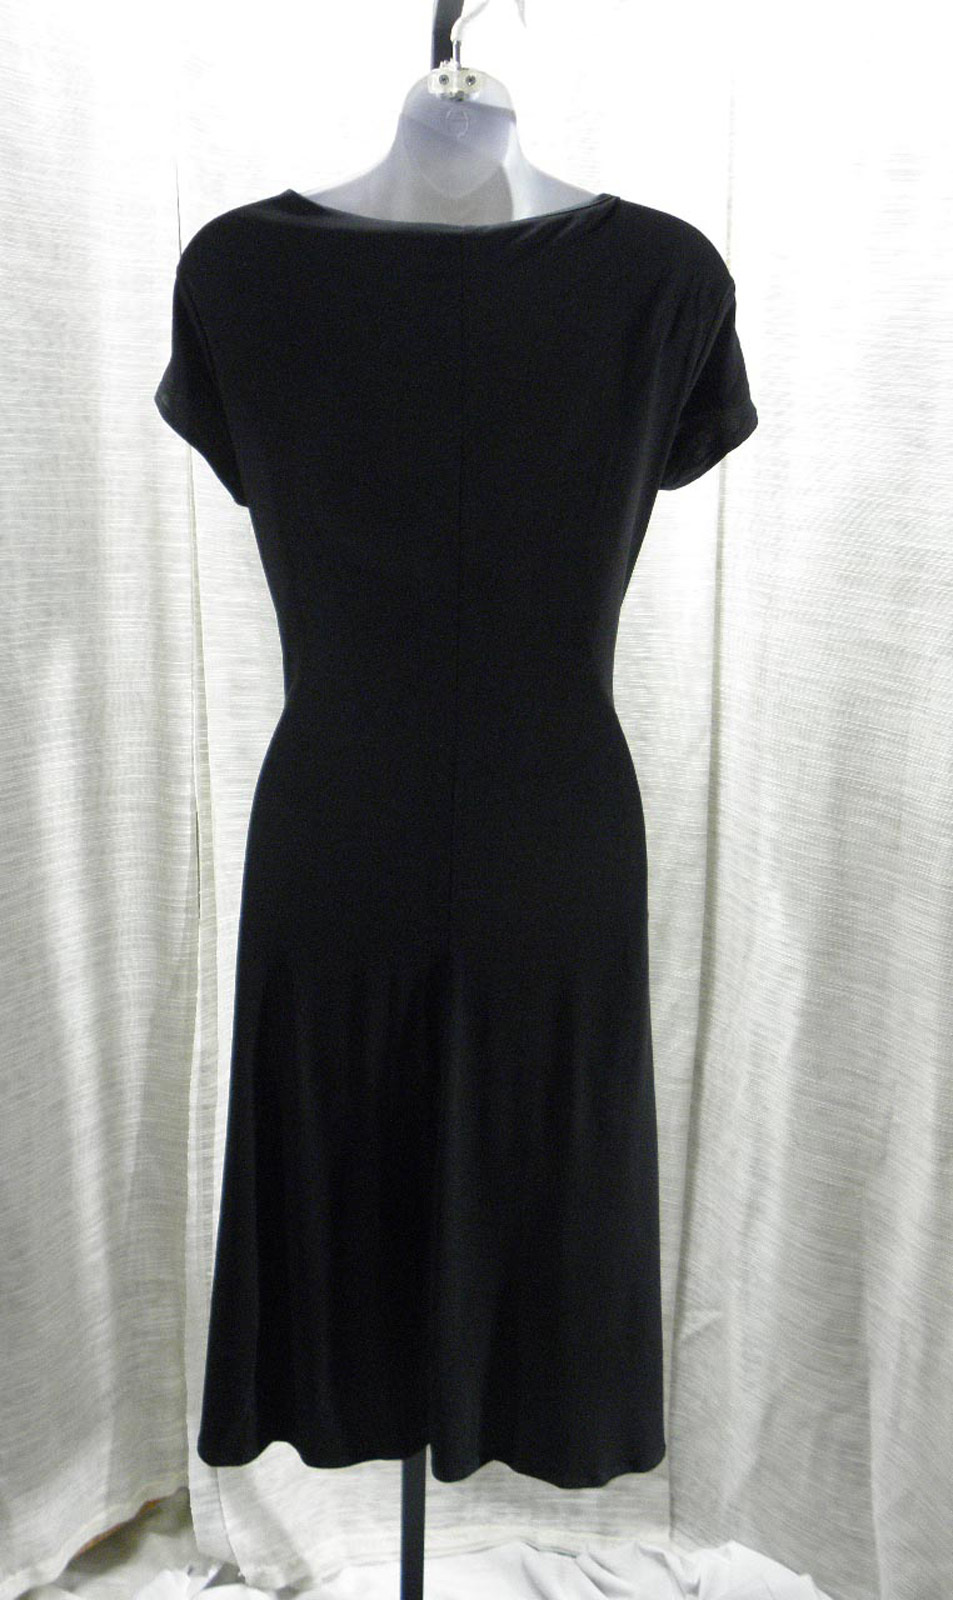 B-Slim Cap-Sleeve Body-Shaper Solid Black Dress Polyester Blend Sz:X Large 16/18